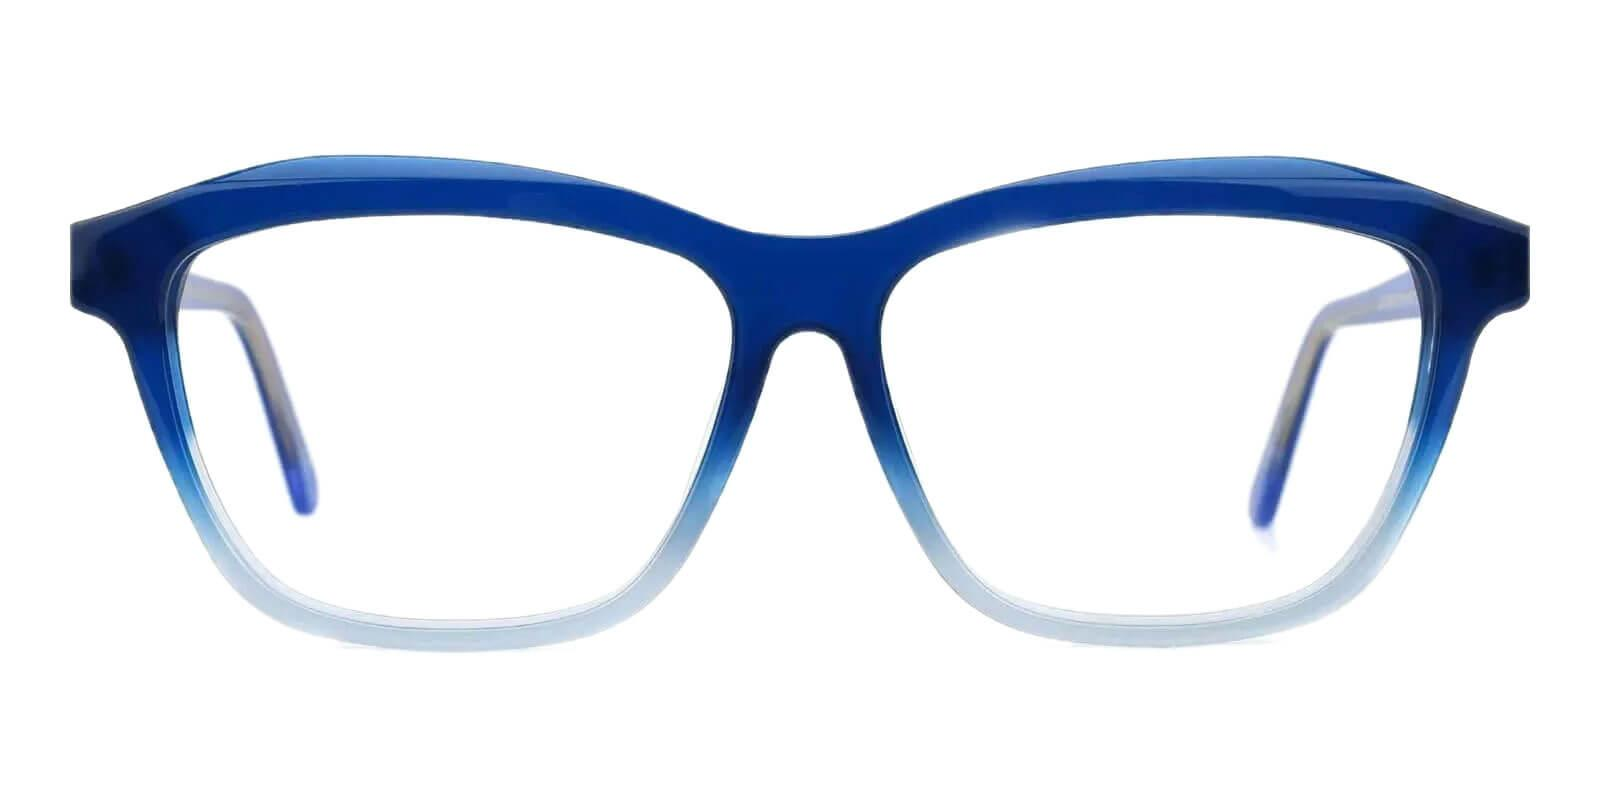 Sonia Blue Acetate Eyeglasses , SpringHinges , UniversalBridgeFit Frames from ABBE Glasses